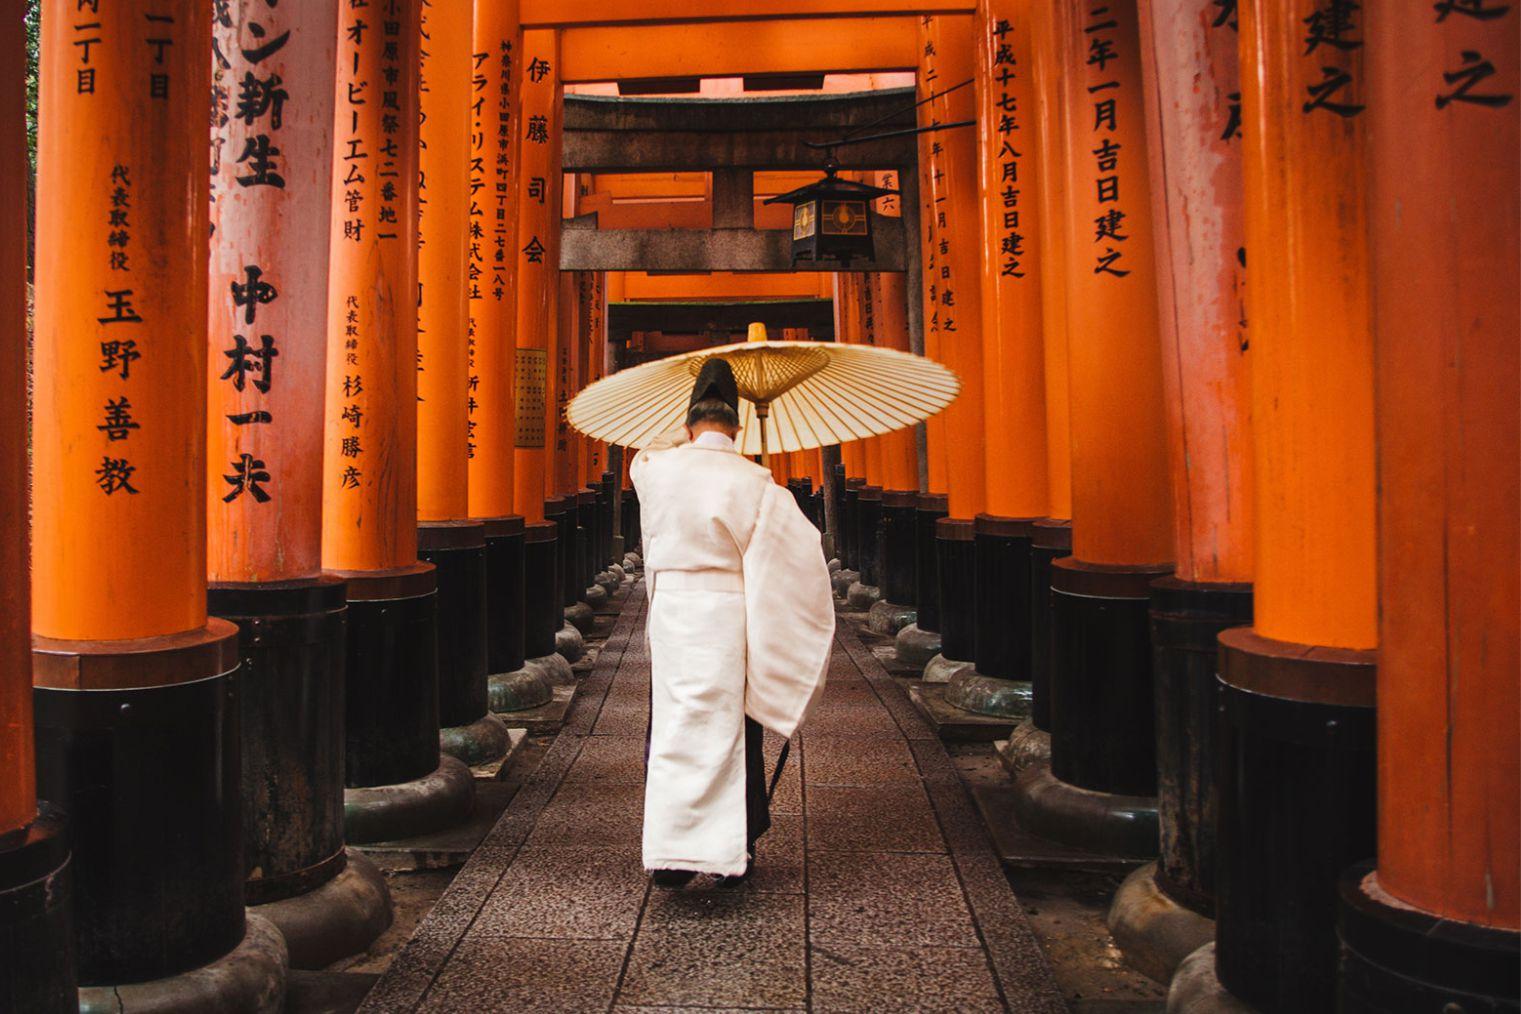 Japan - Tourist information